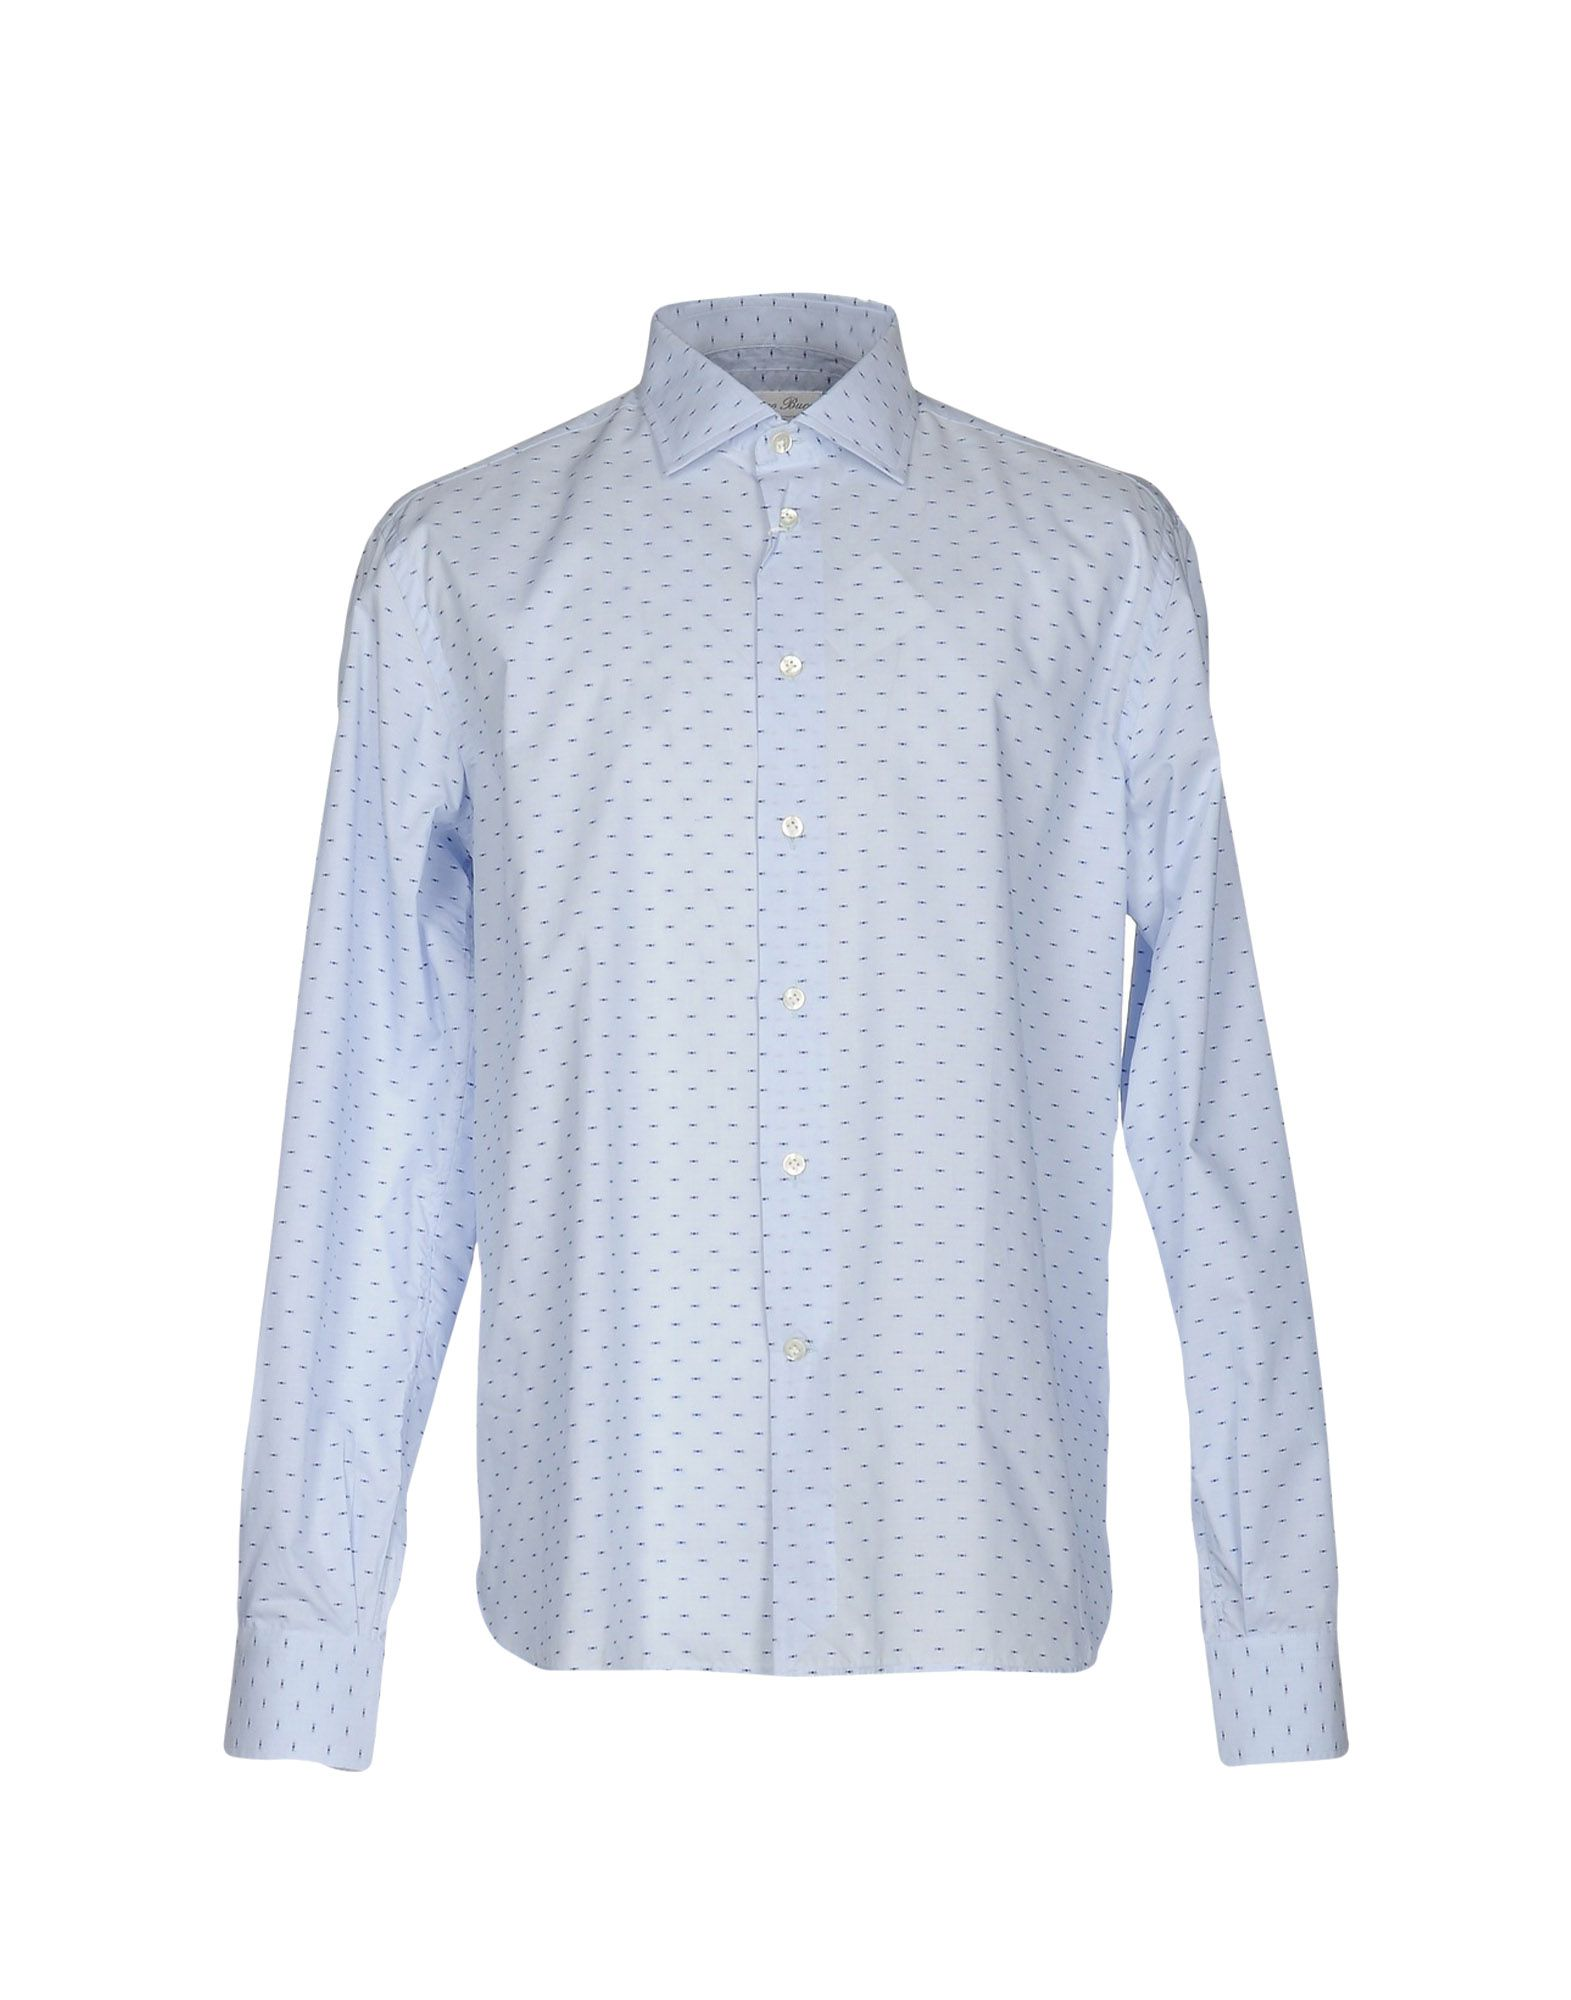 ROMEO BUCCI Pубашка цены онлайн